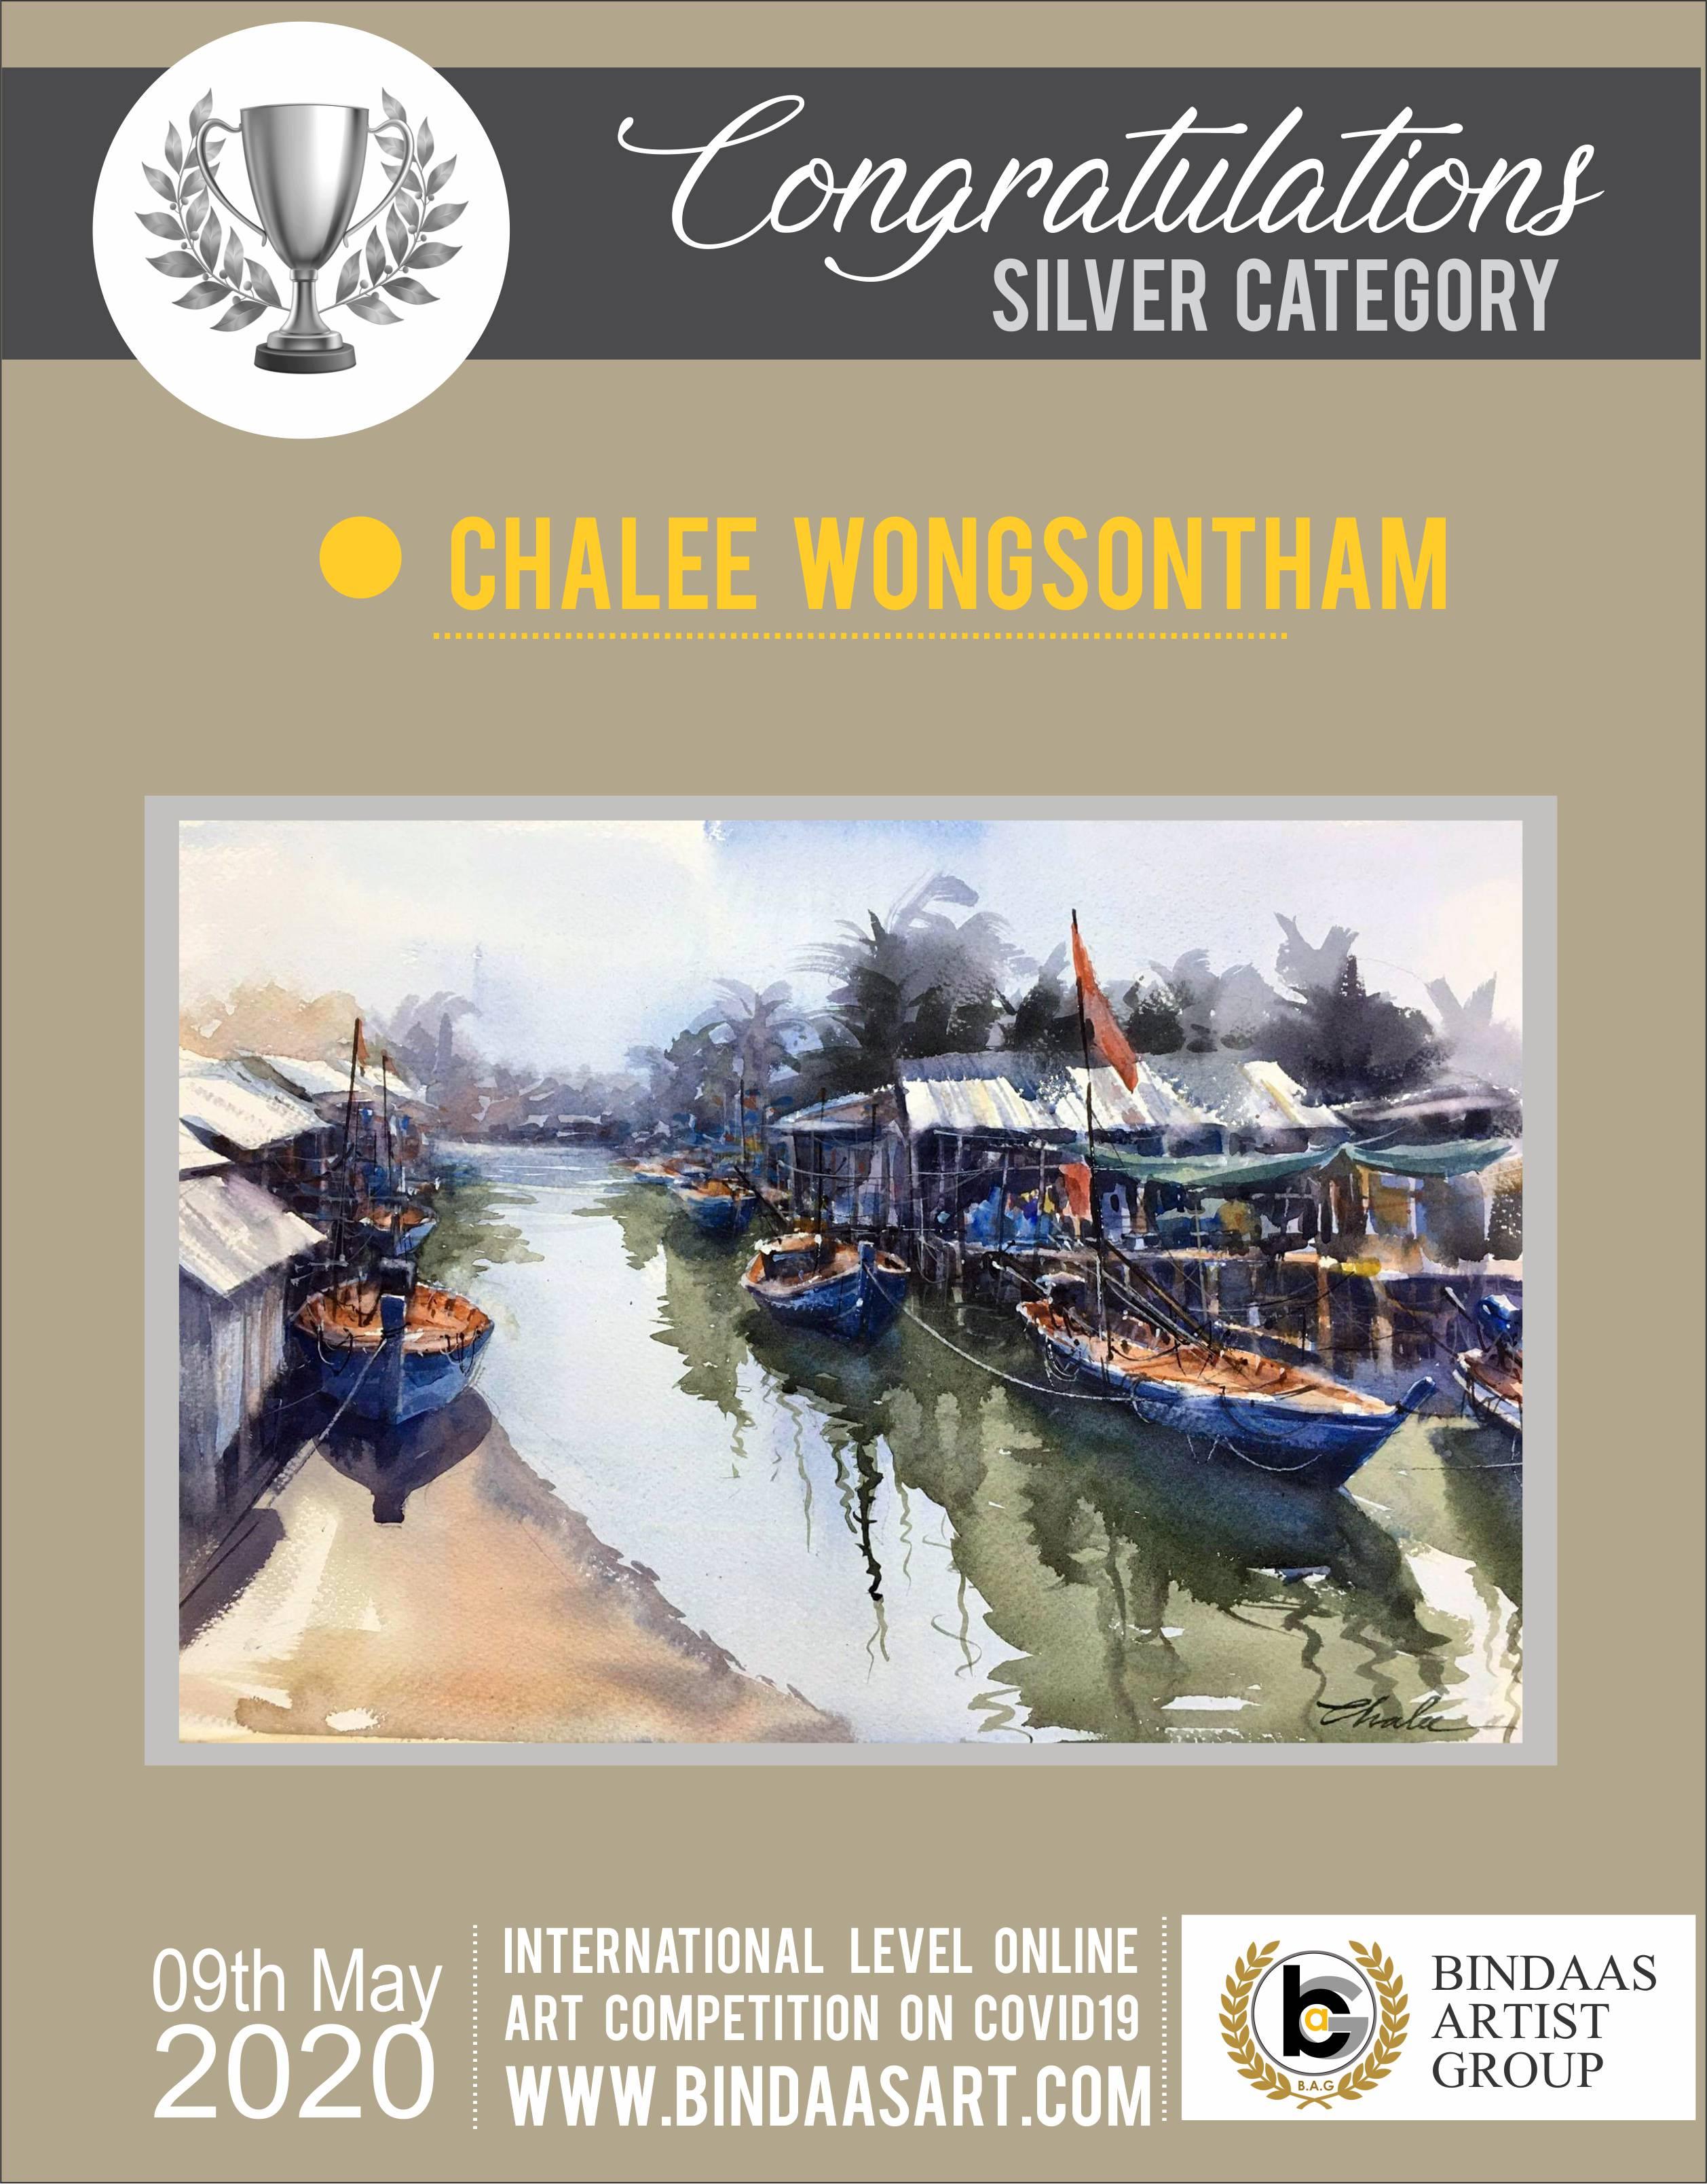 Chalee wongsontham